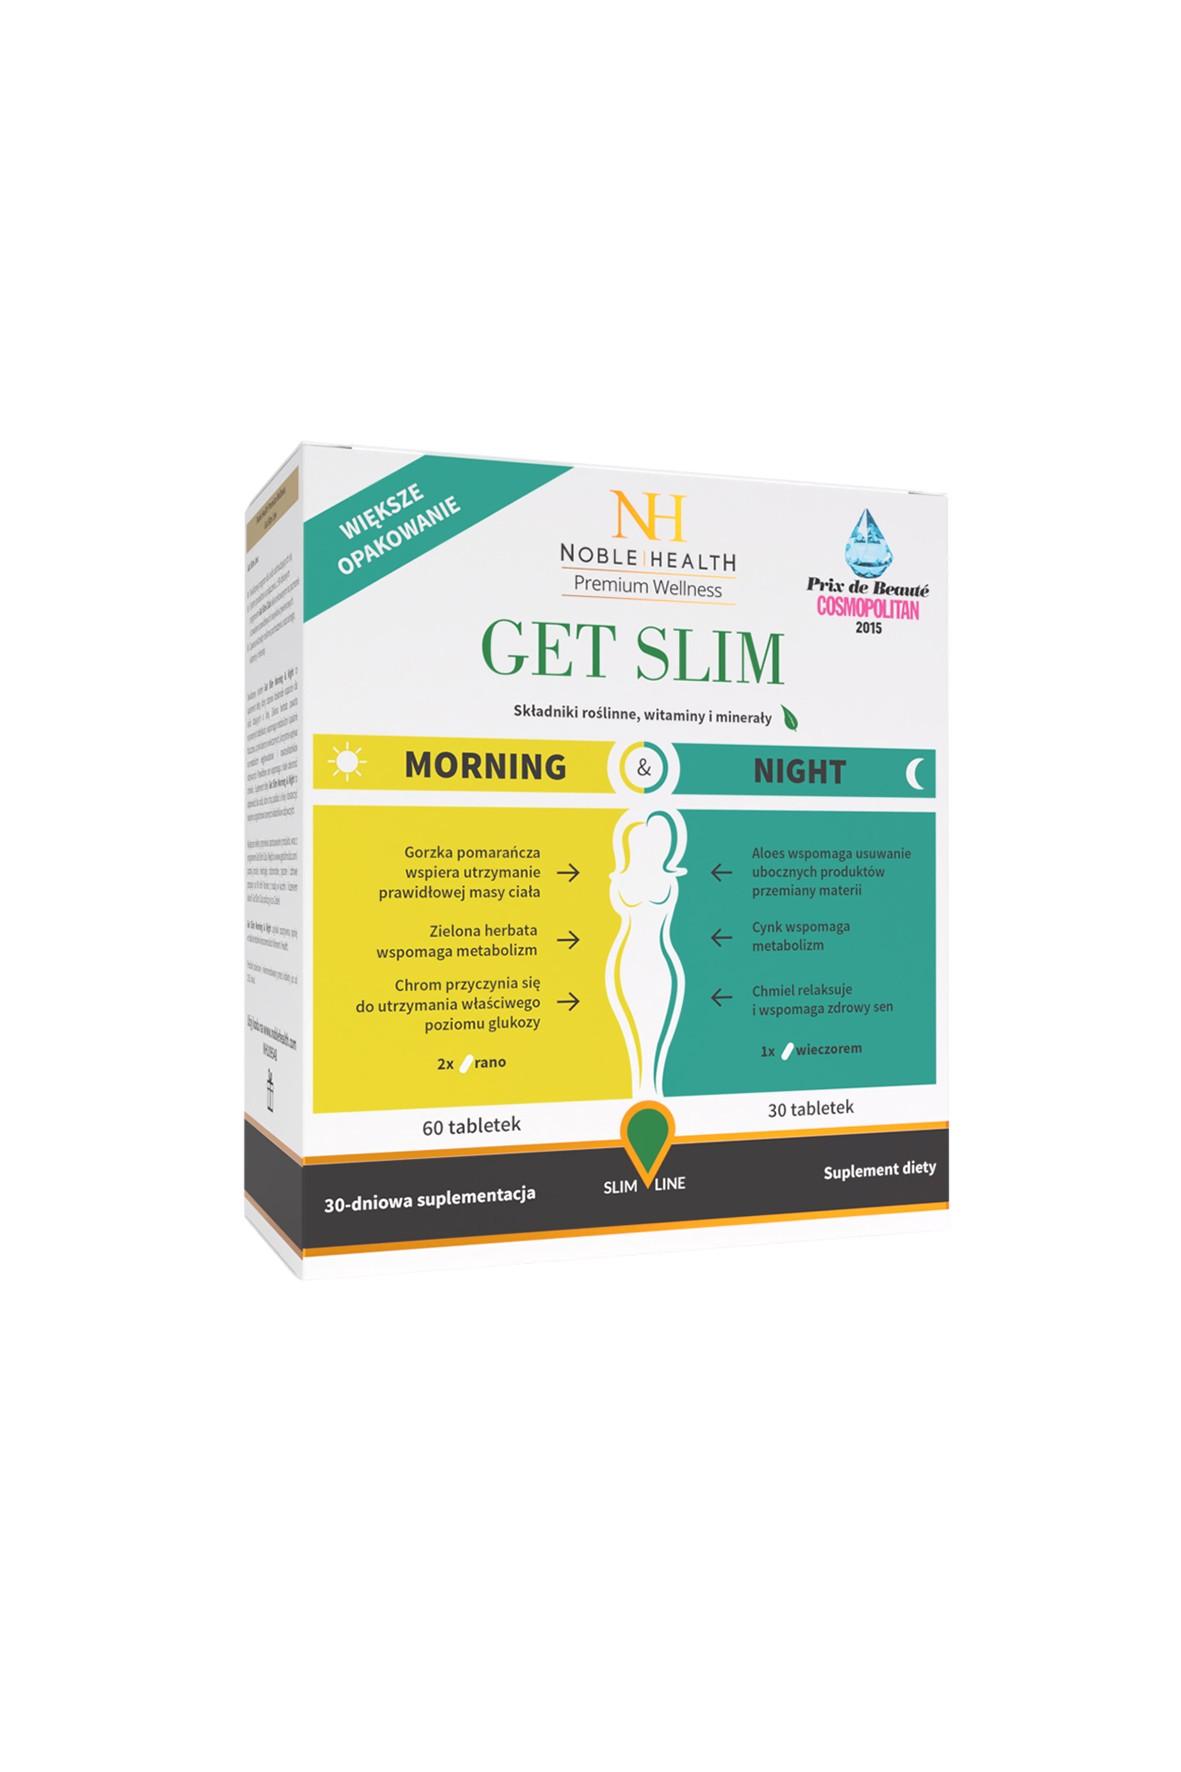 Get Slim Morning&Night suplement diety 90 tabletek